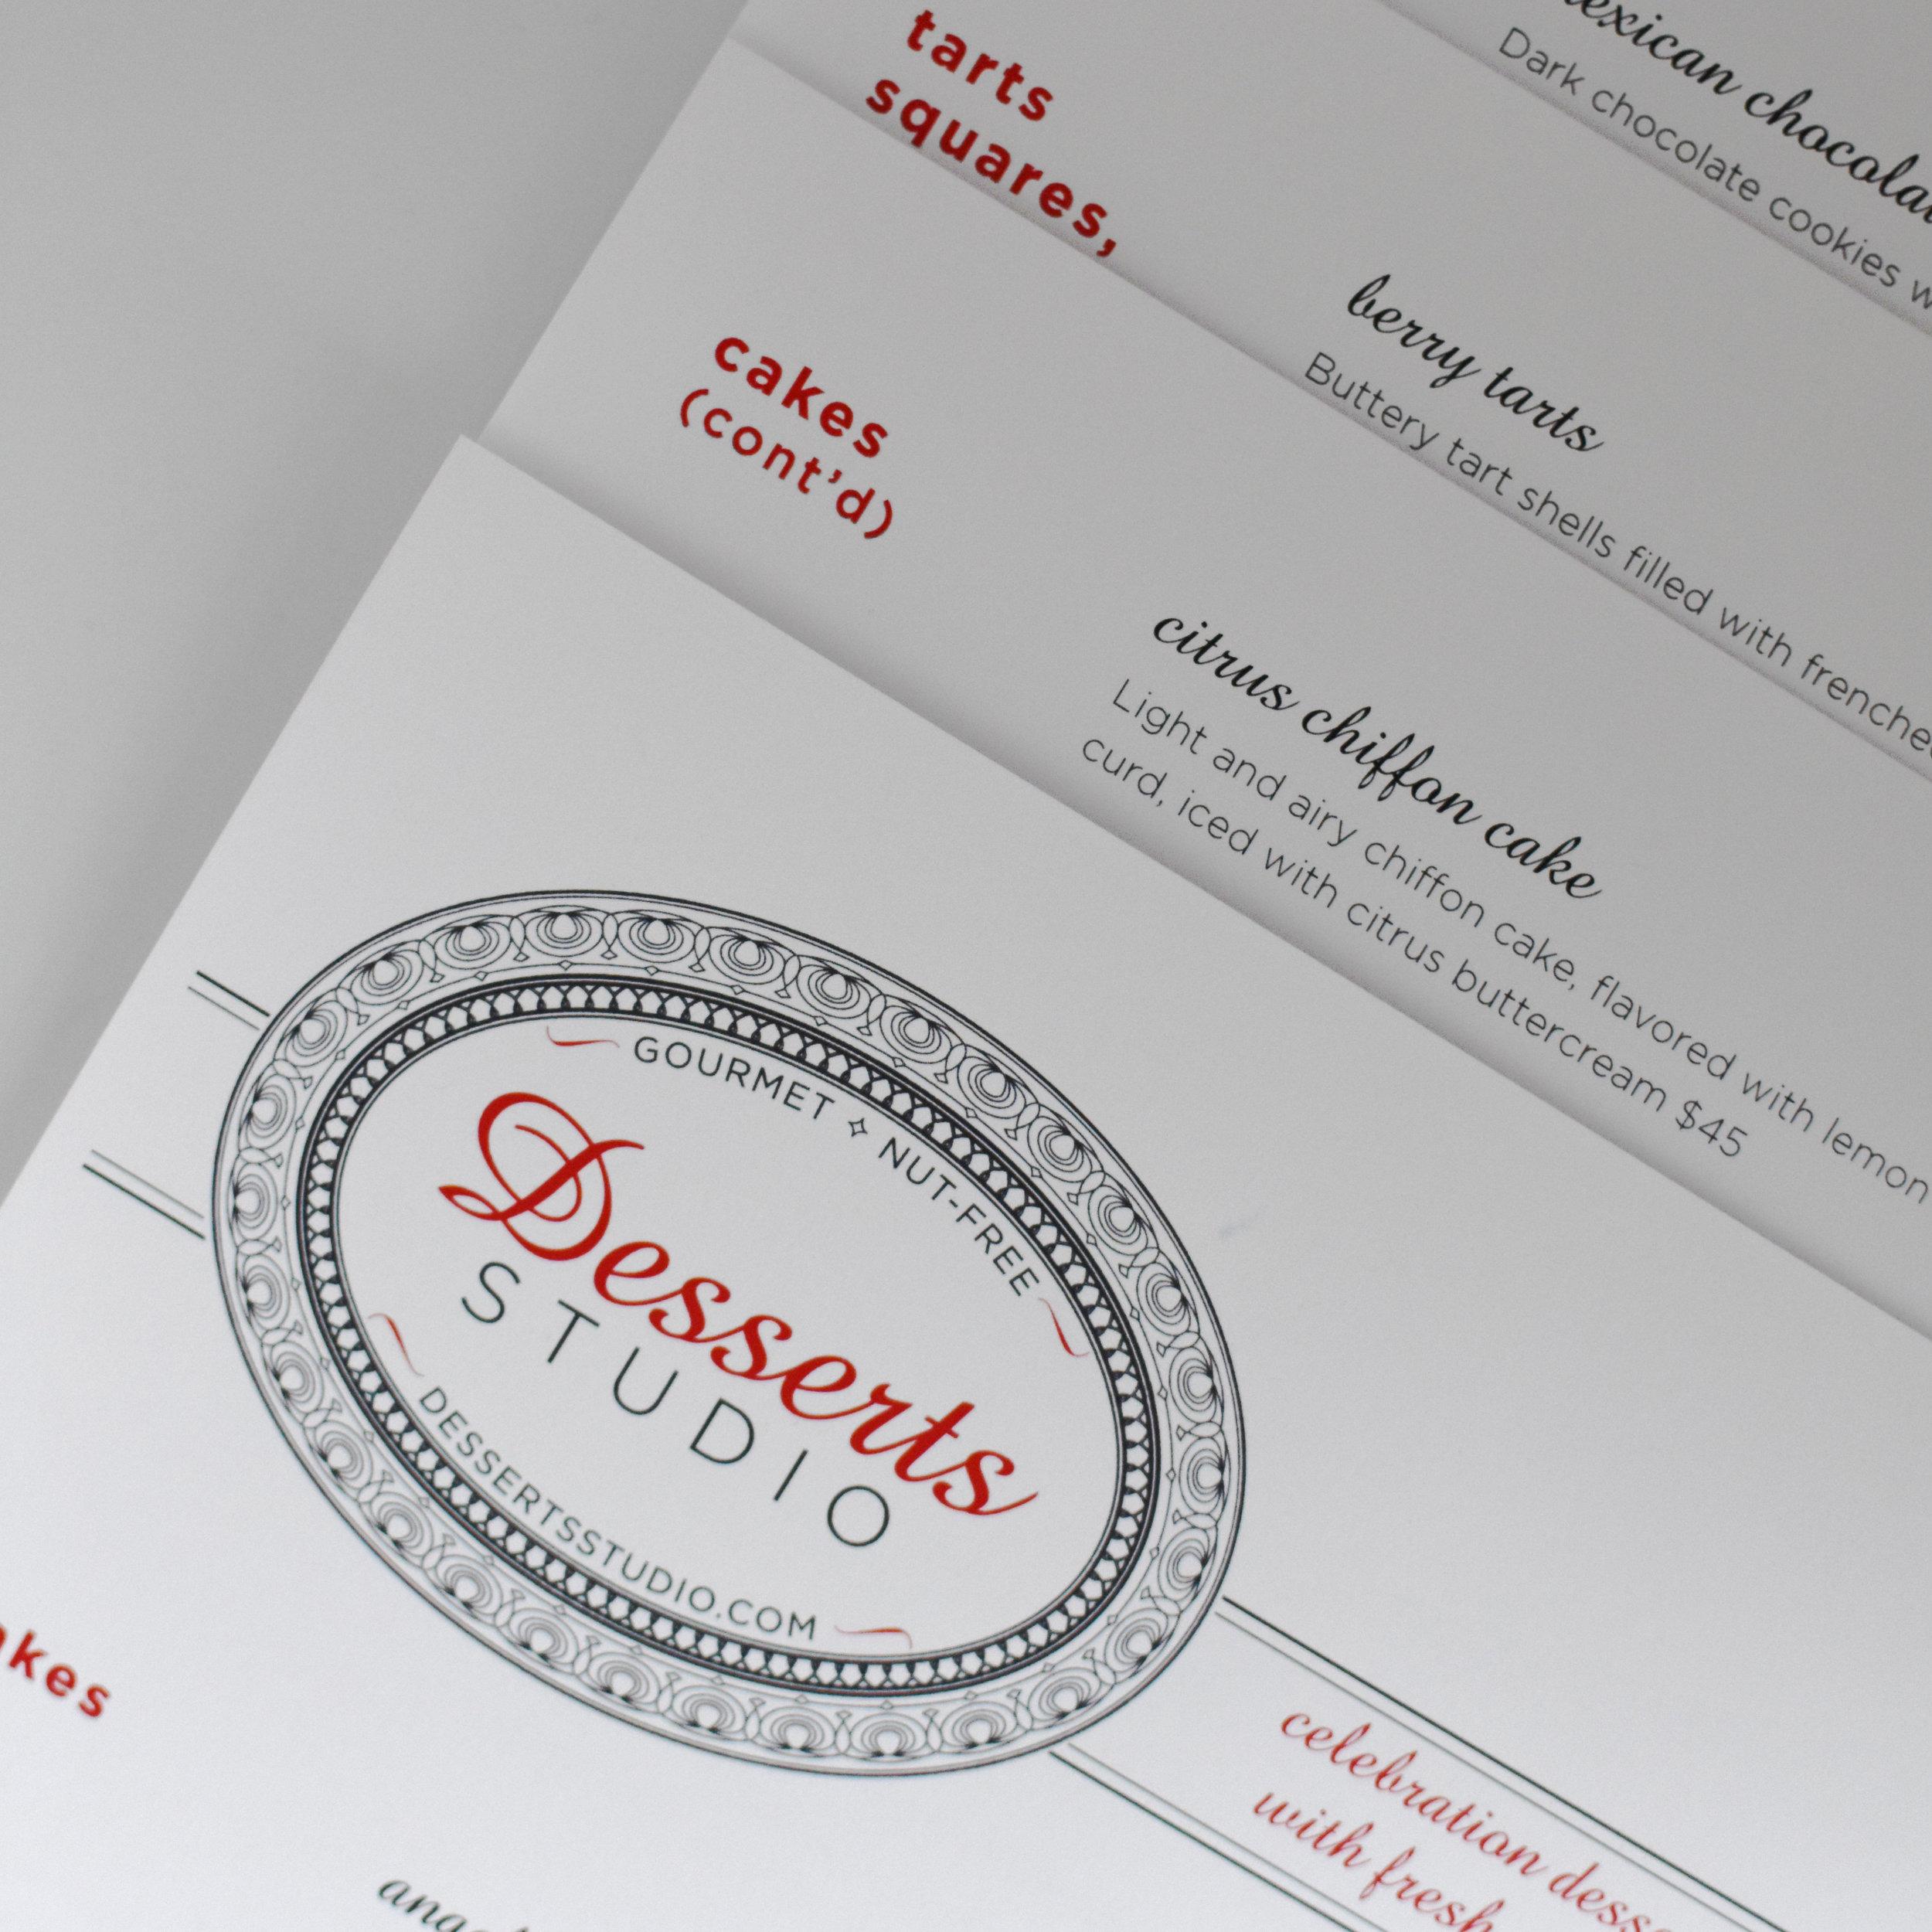 DessertMenuDesign.jpg